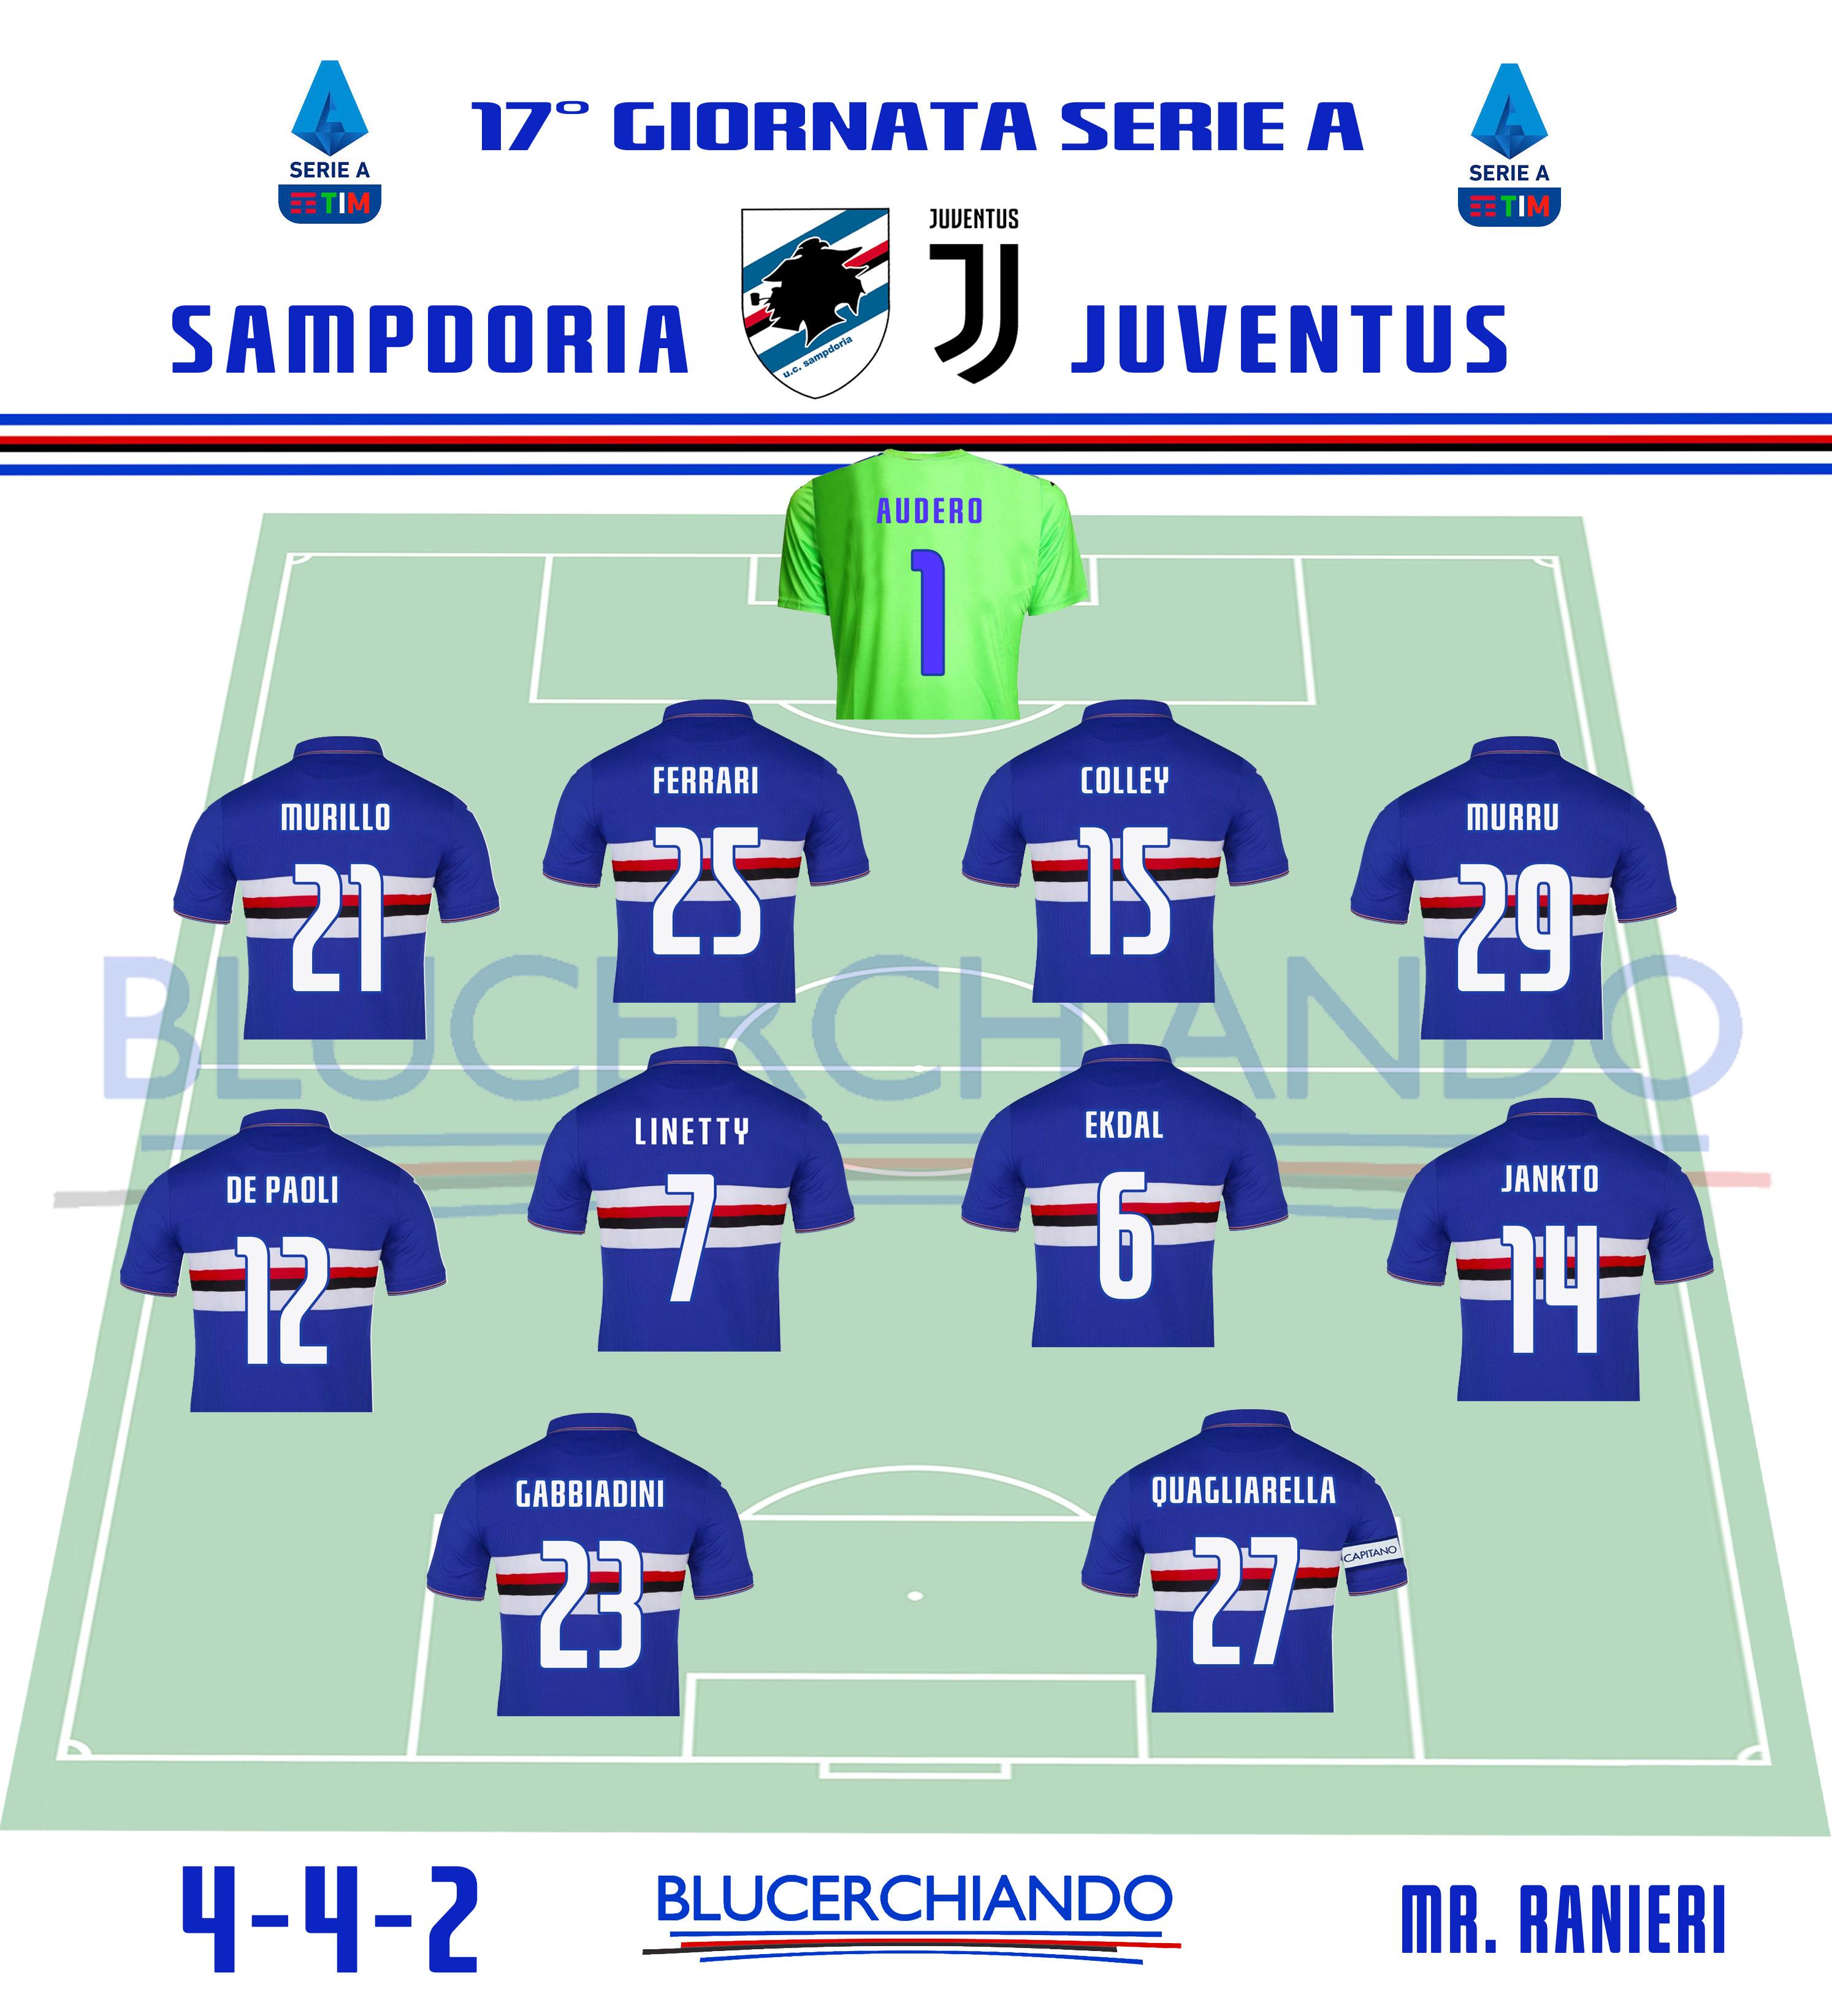 Sampdoria Juventus 17a Giornata Formazioni Tattiche E Diretta Tv Blucerchiando